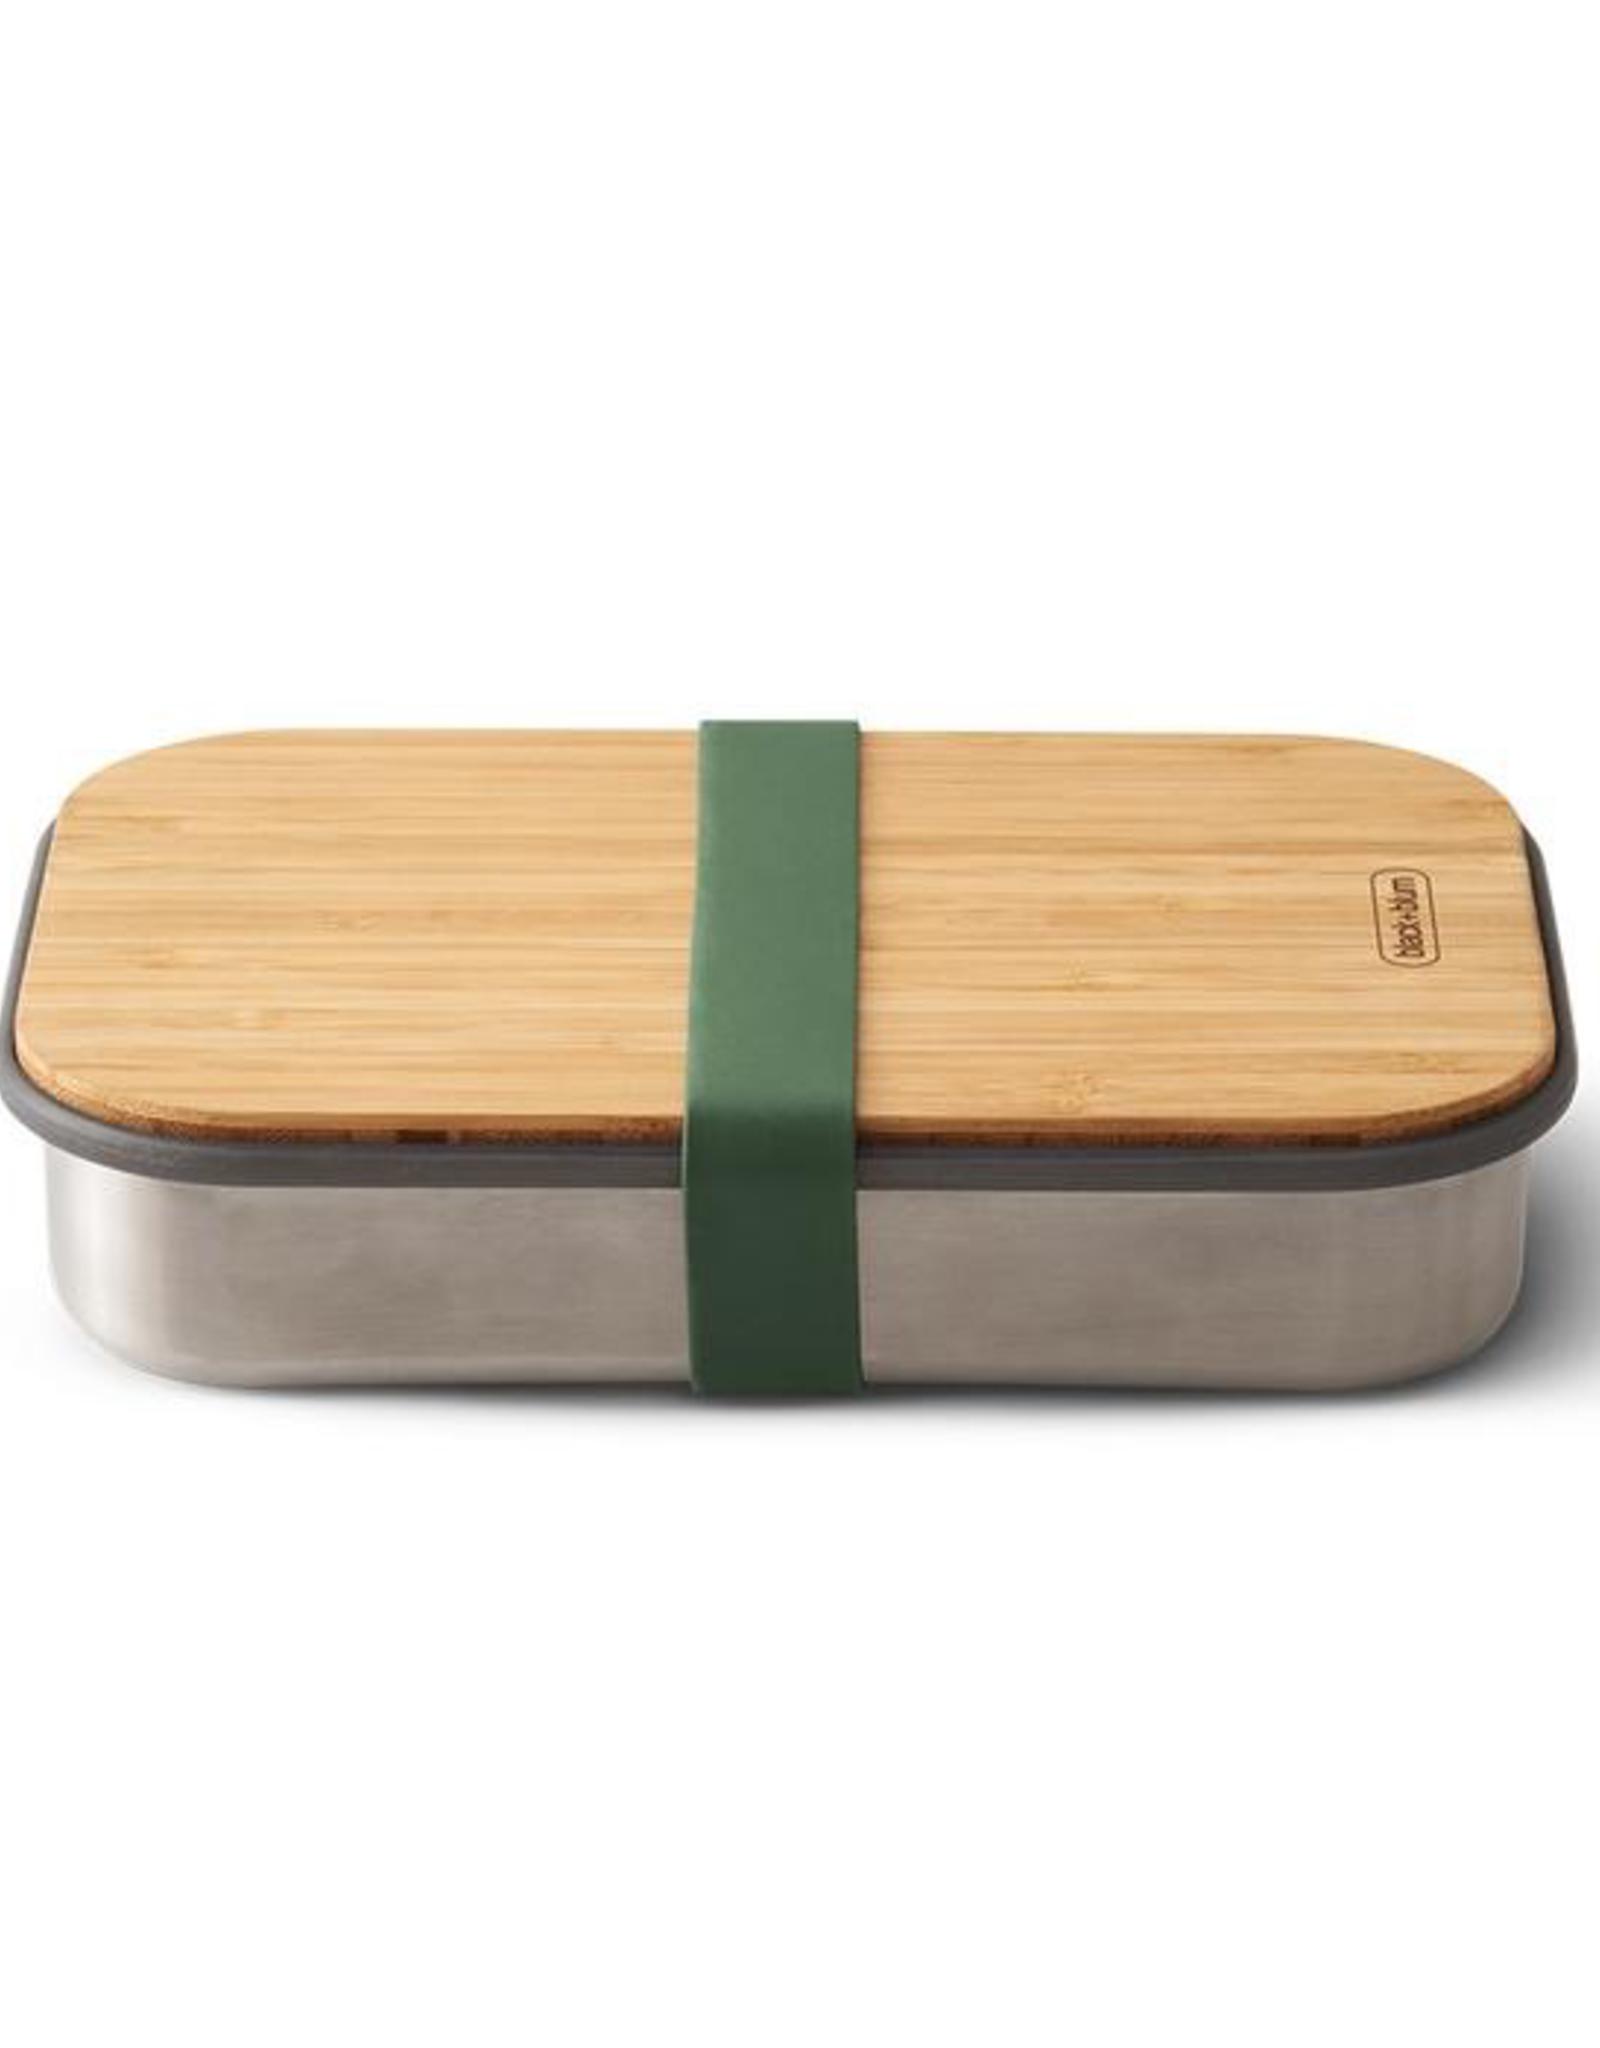 Bam Sandwich Box- Olive